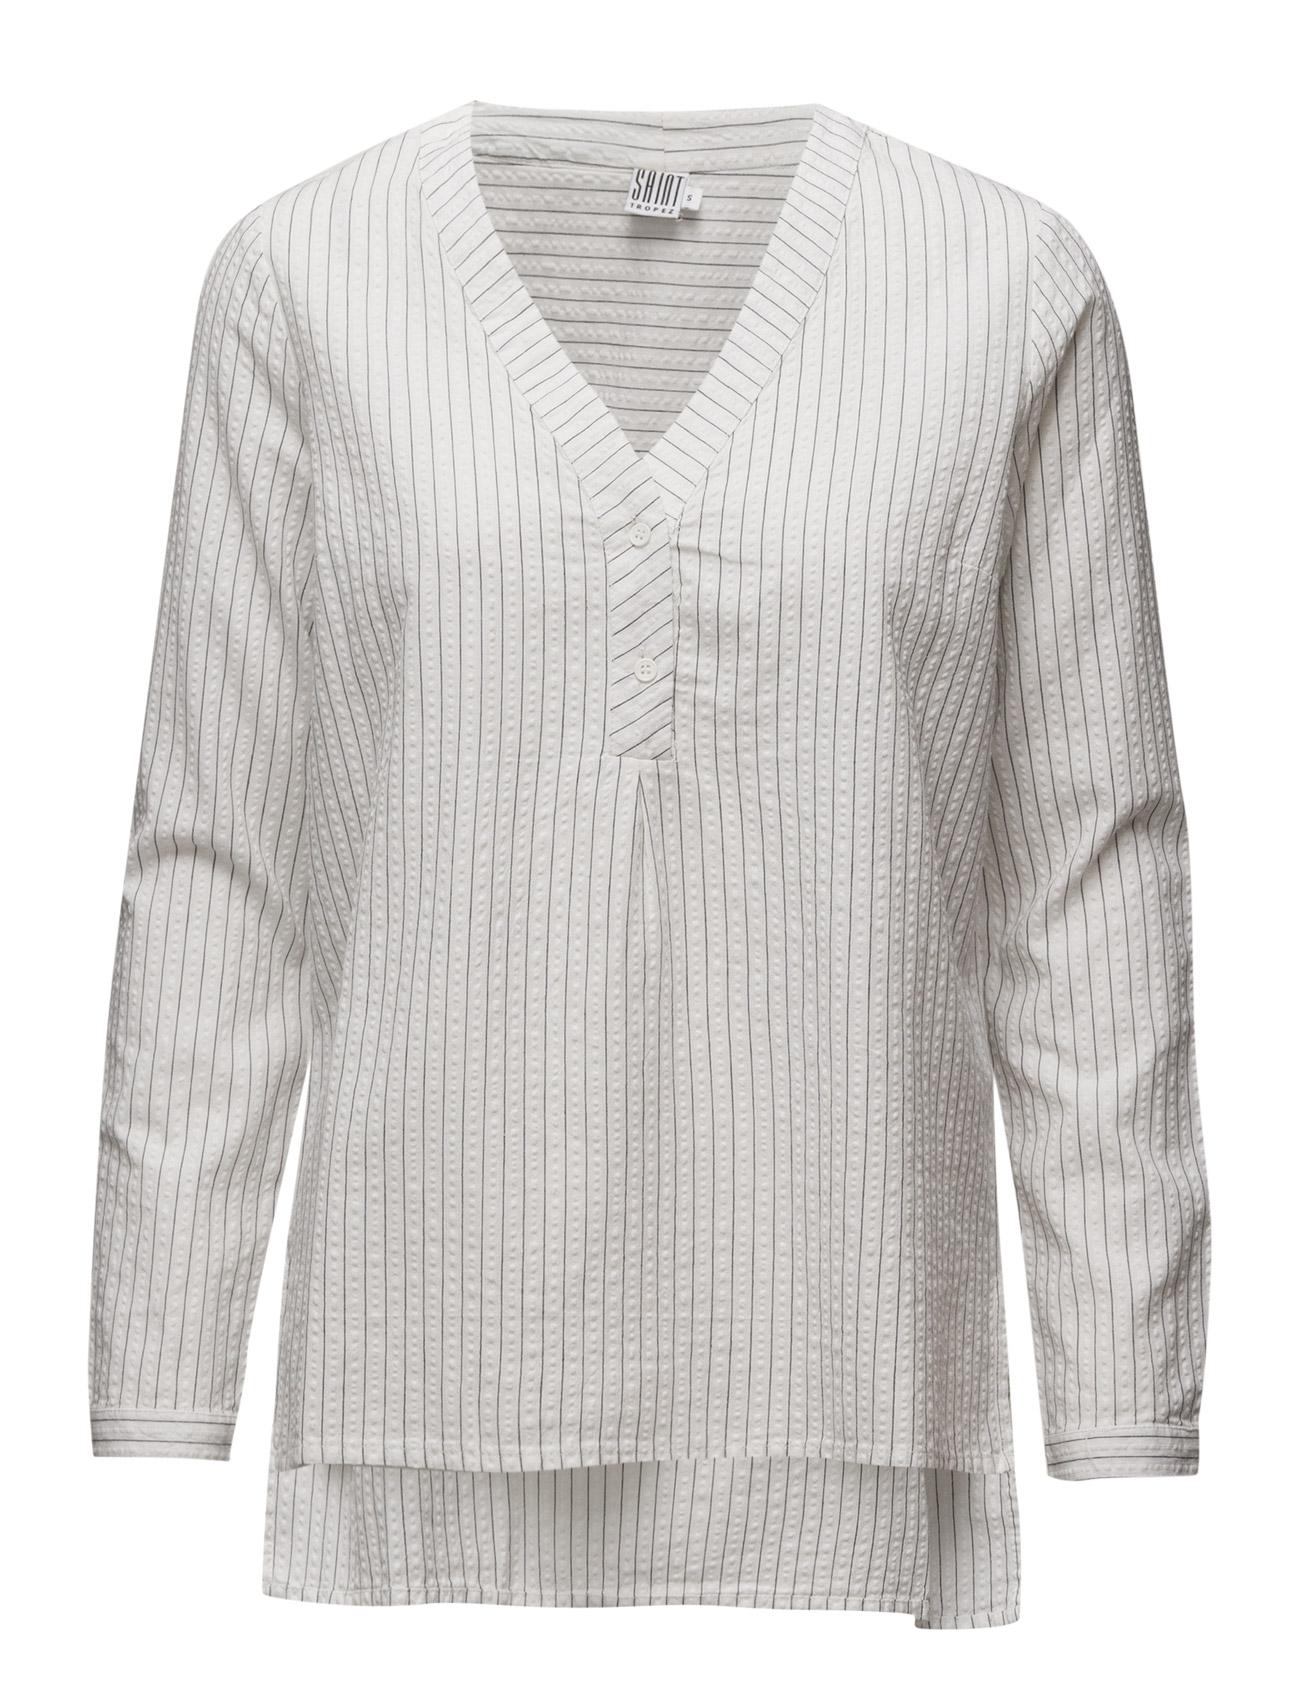 saint tropez – Shirt with stripes fra boozt.com dk